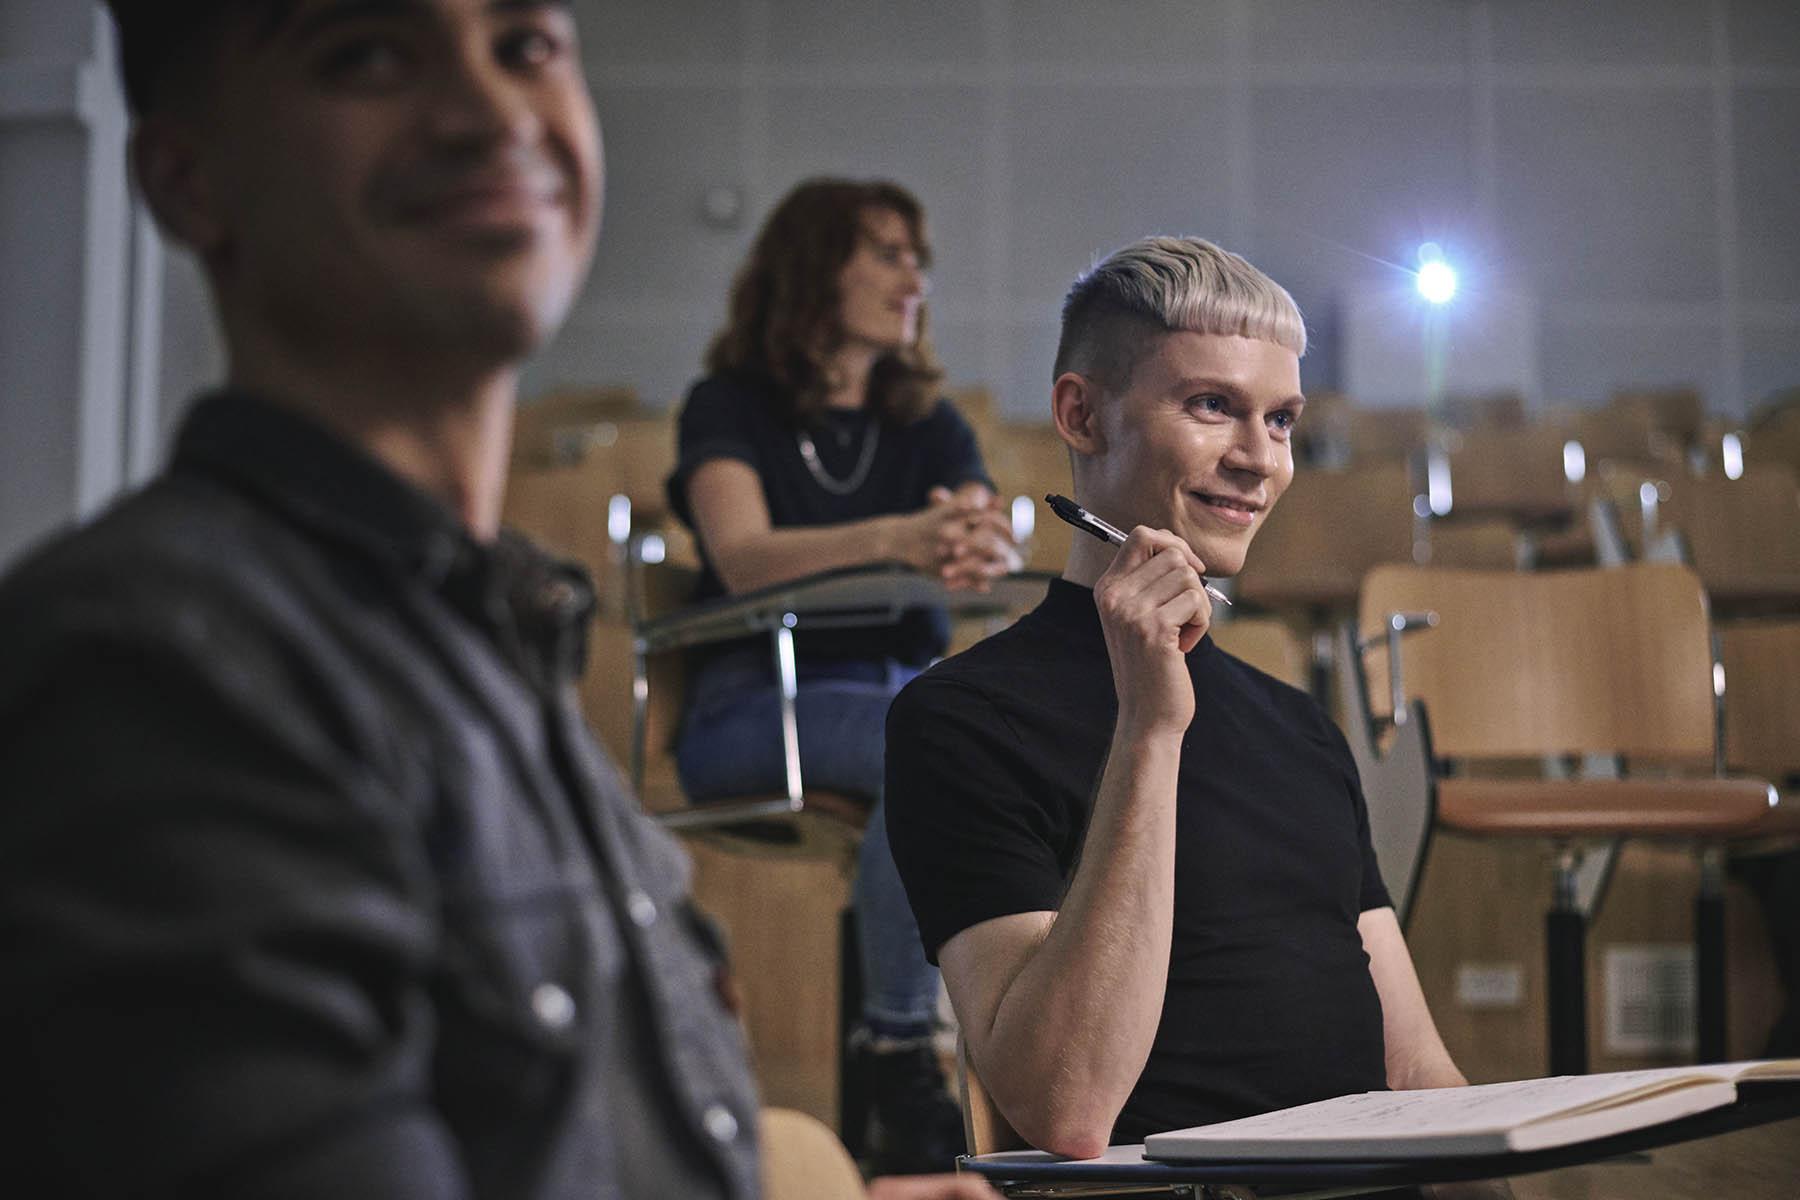 Tre meritpædagog-studerende sidder i et auditorium